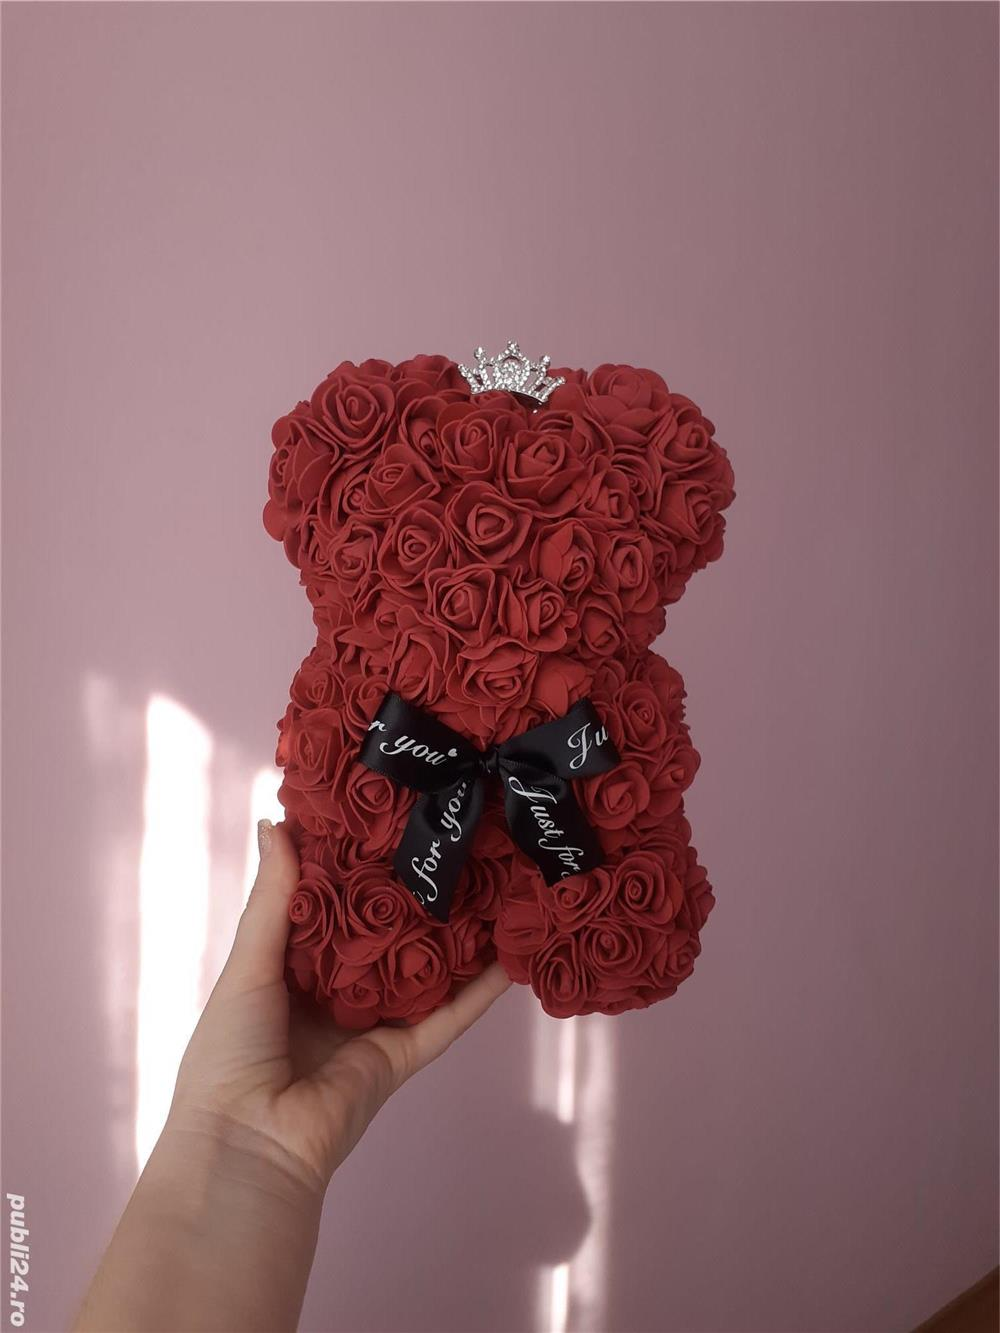 Ursuleti de trandafiri - Cadoul perfect!